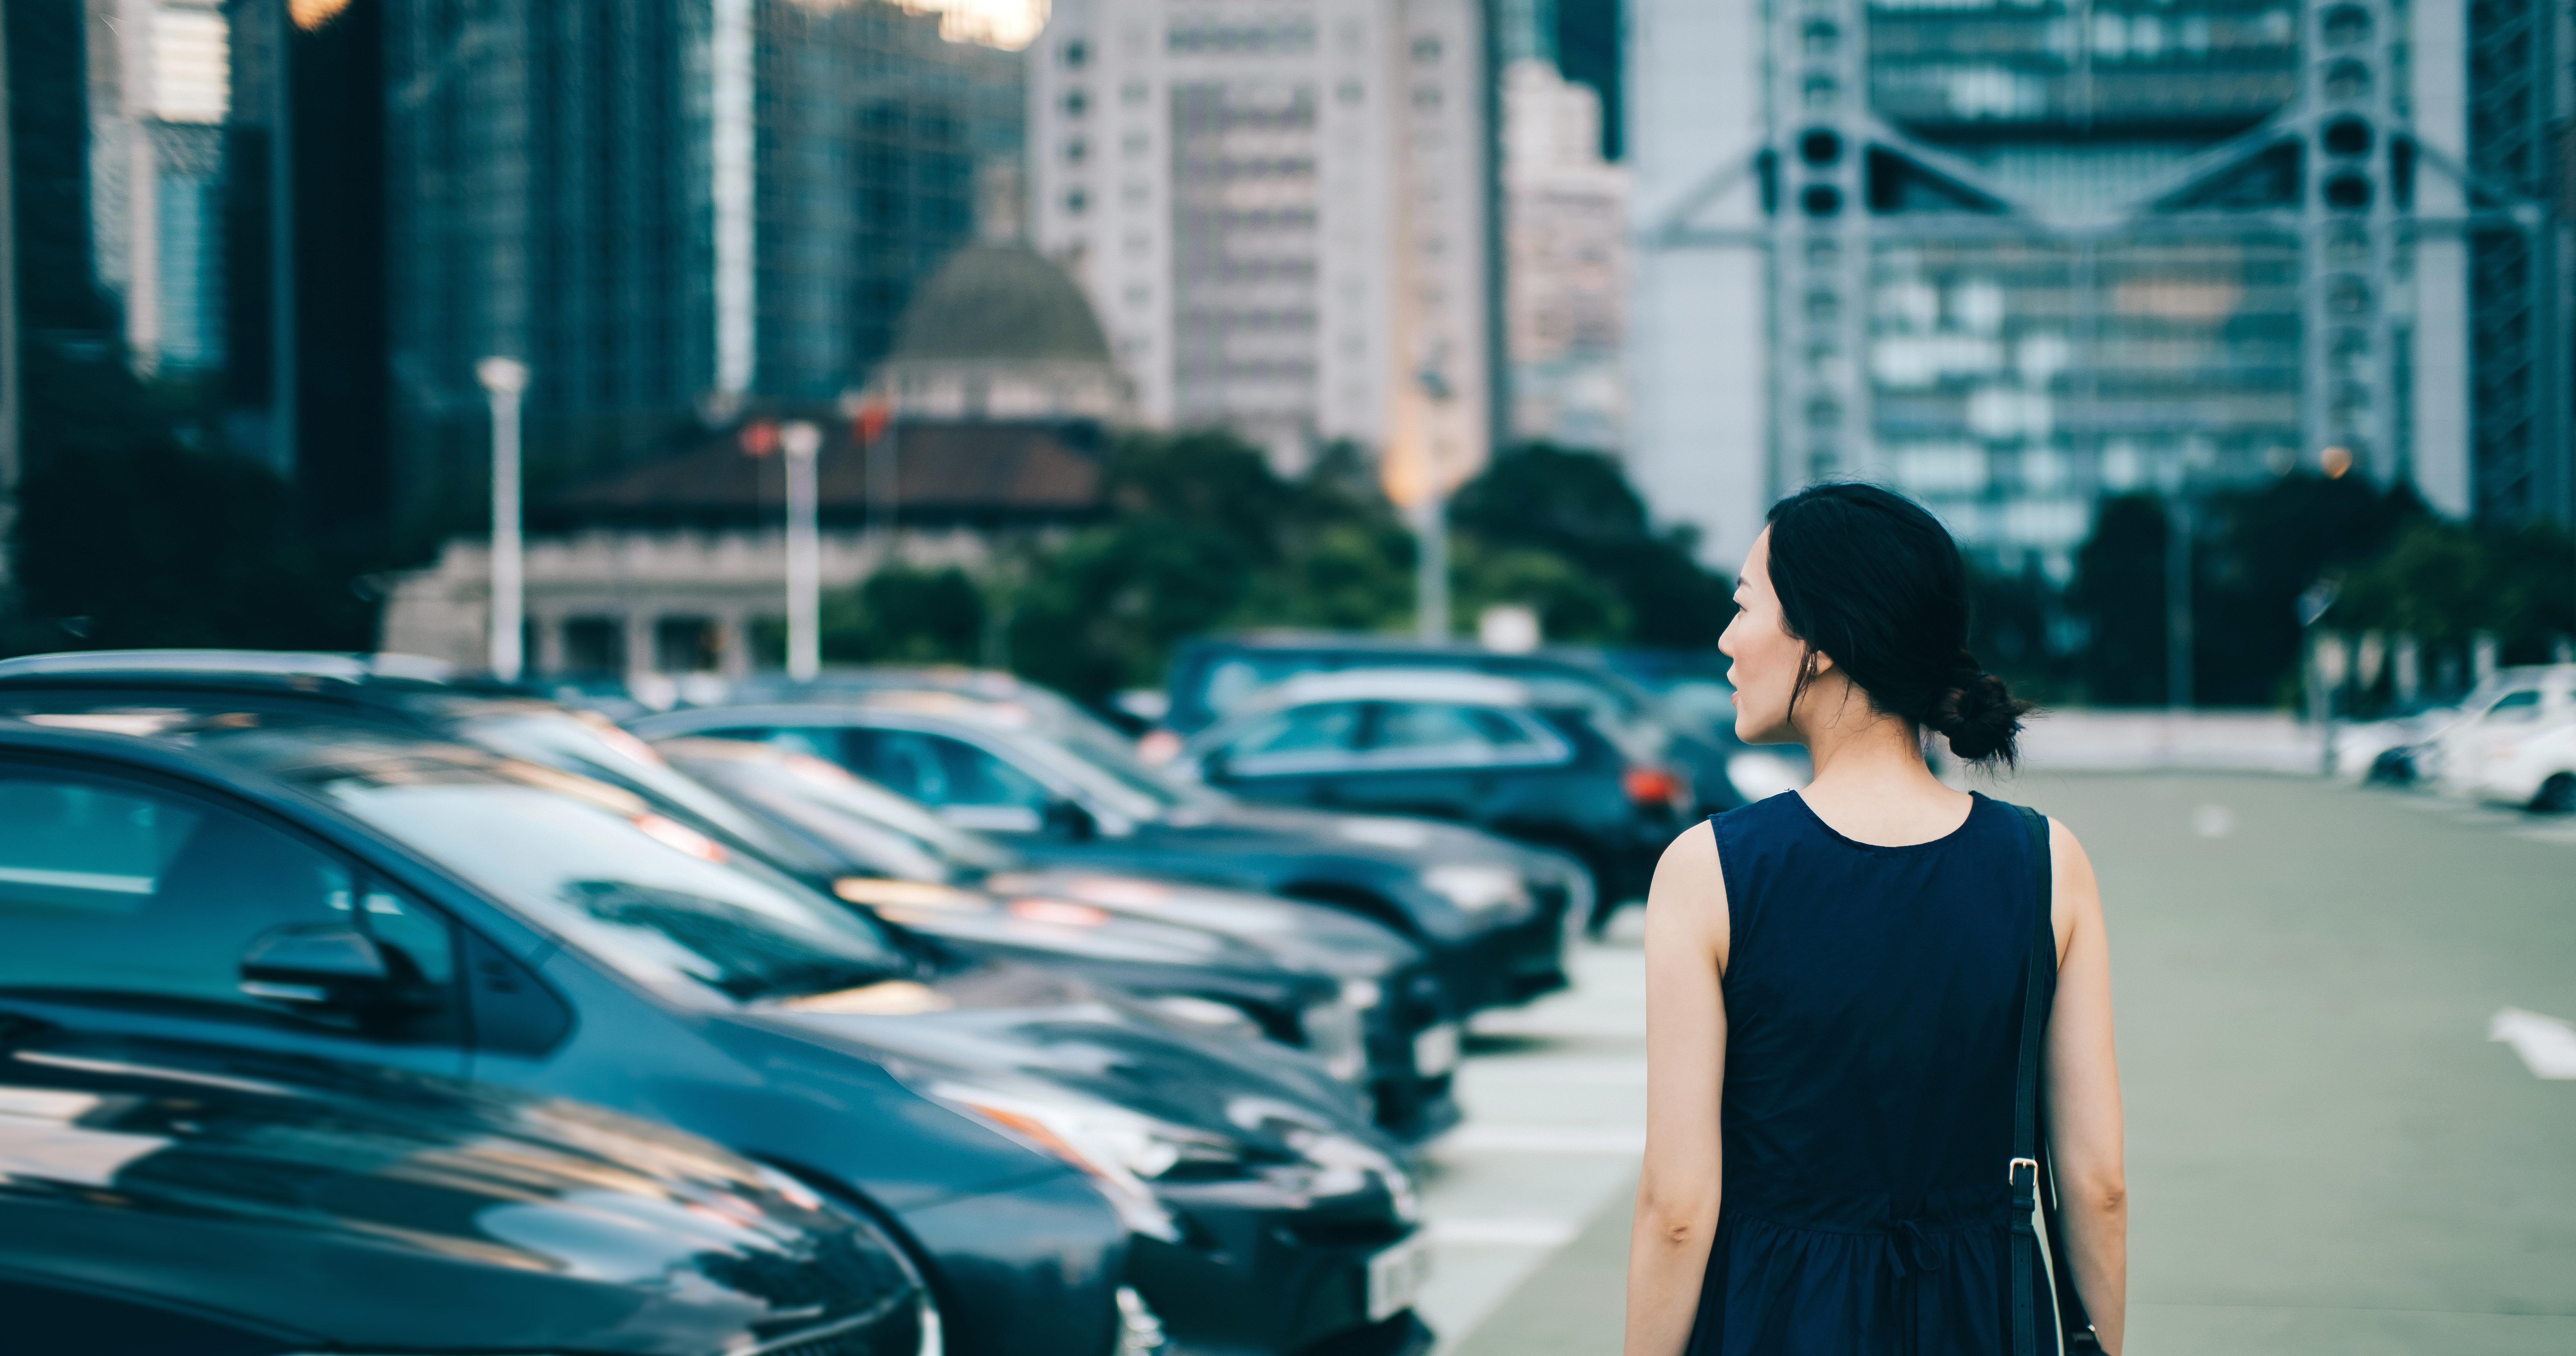 Viral Tweet Highlights What Women Do To Feel Safe Walking Alone At